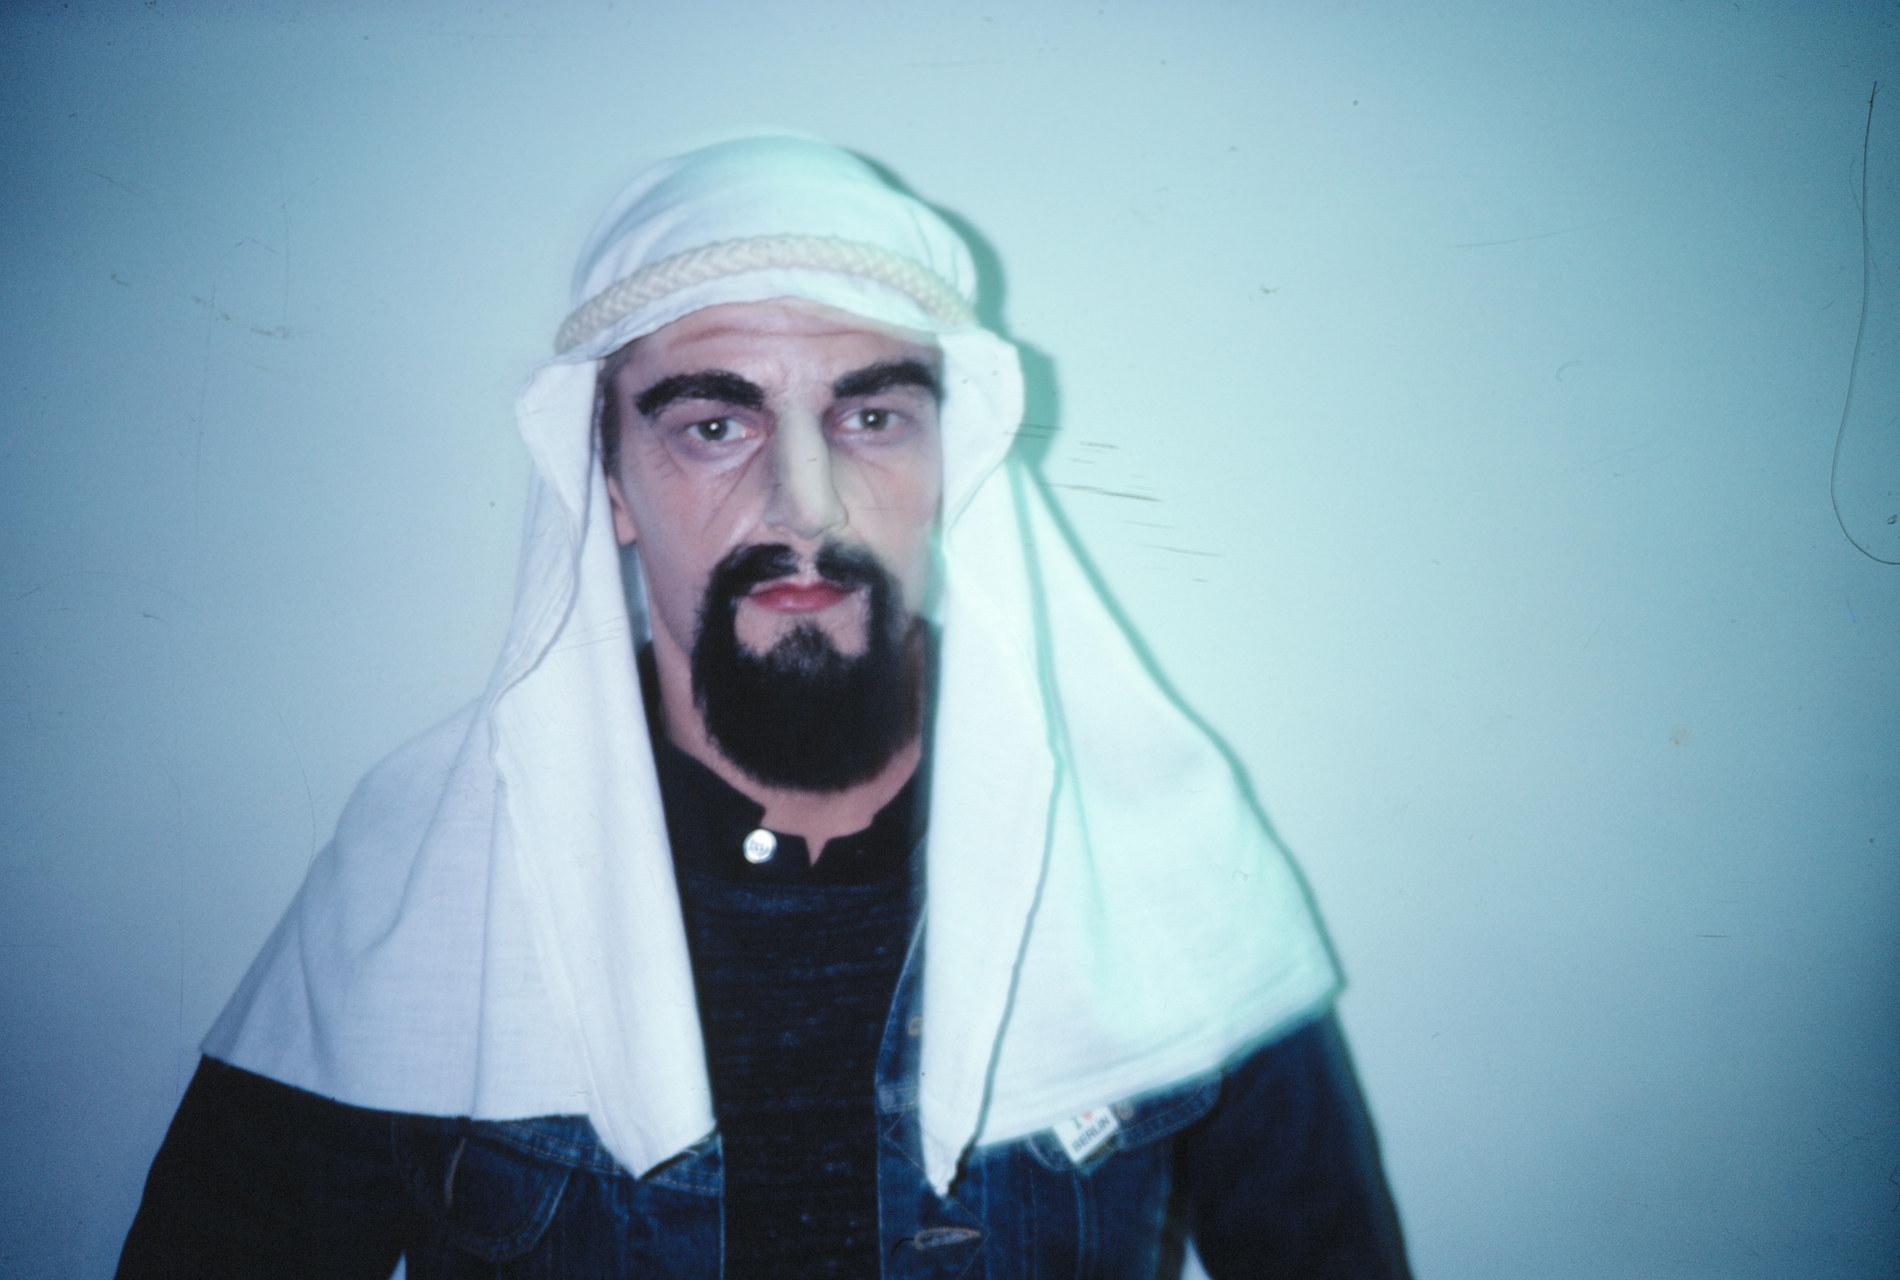 Jan_Fabre,_The_Arabian_Prince,_1978_collection_M_HKA